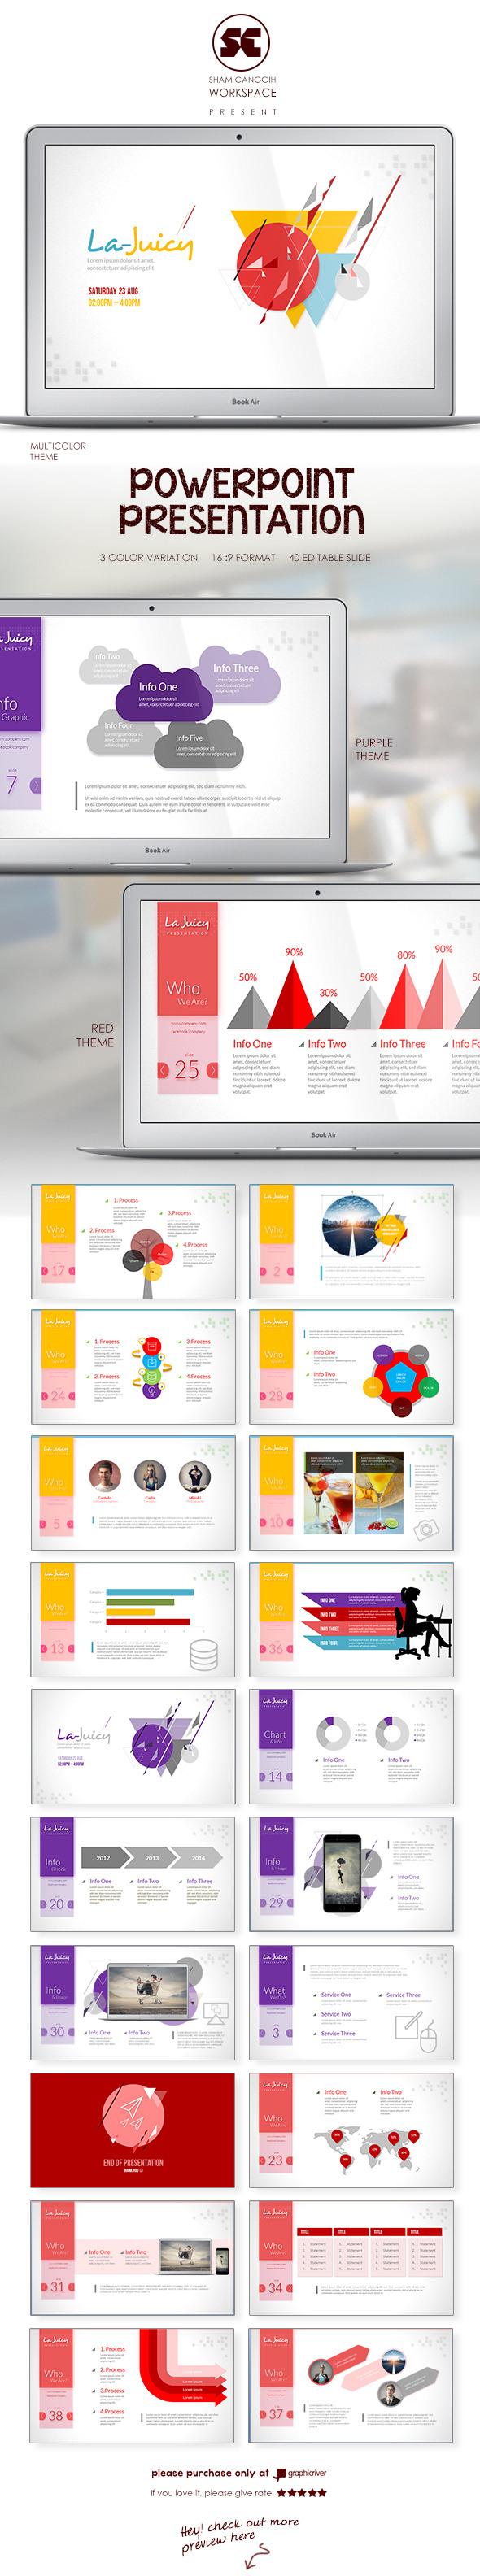 PowerPoint Presentation Template - Miscellaneous PowerPoint Templates